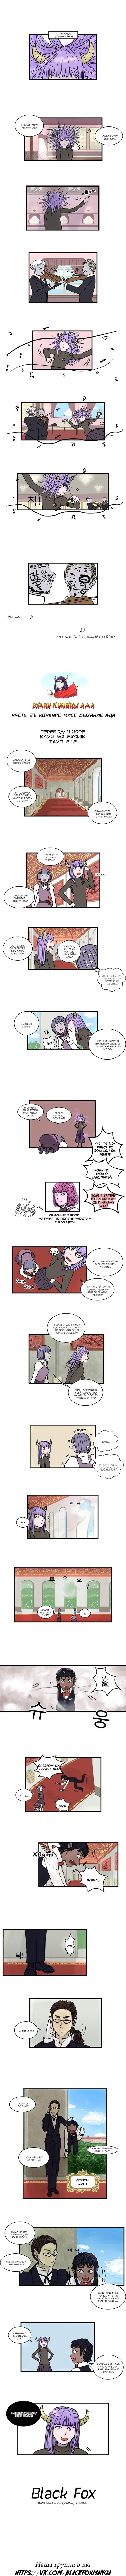 https://r2.ninemanga.com/comics/pic3/23/27095/1295307/1546372603780.jpg Page 1